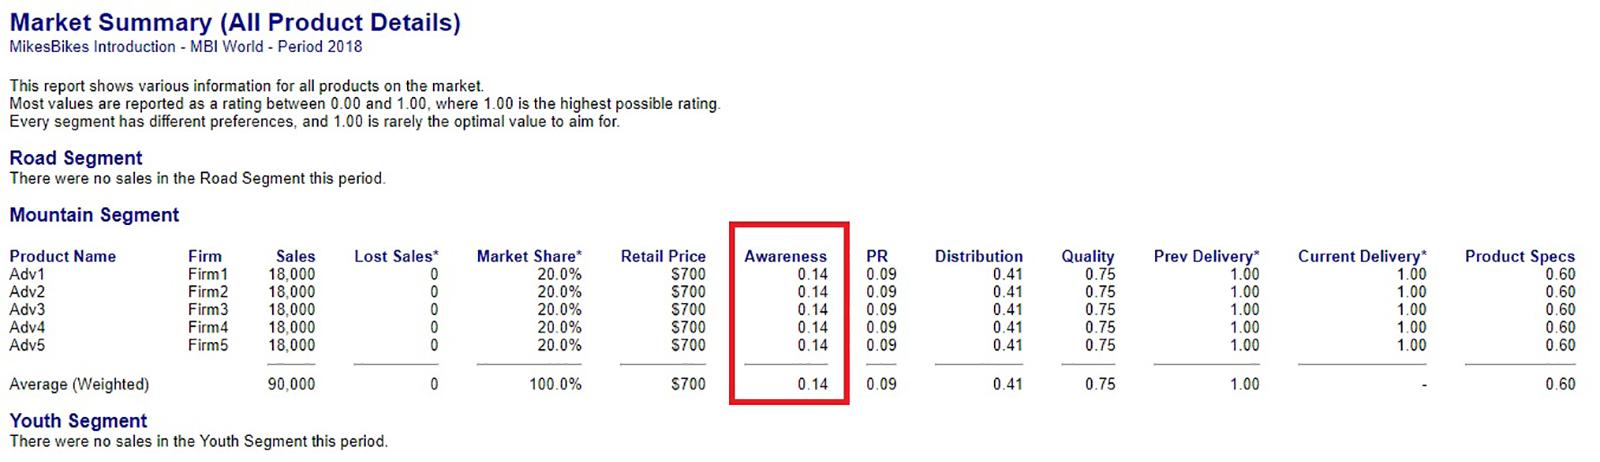 MikesBikes' Market Summary Report